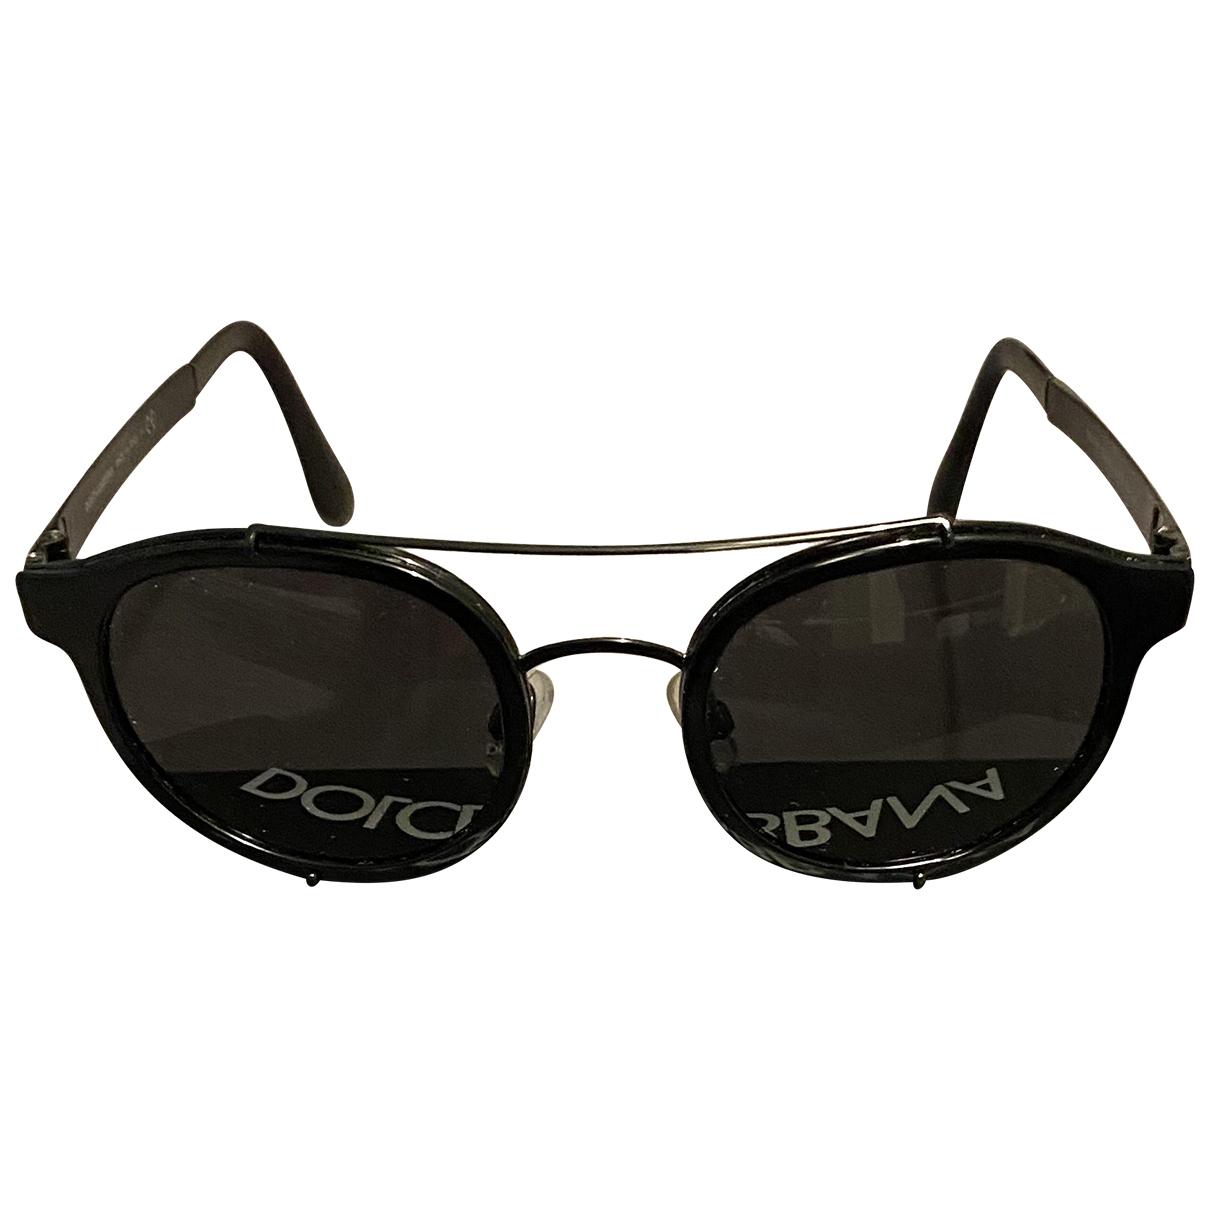 Dolce & Gabbana N Black Metal Sunglasses for Men N